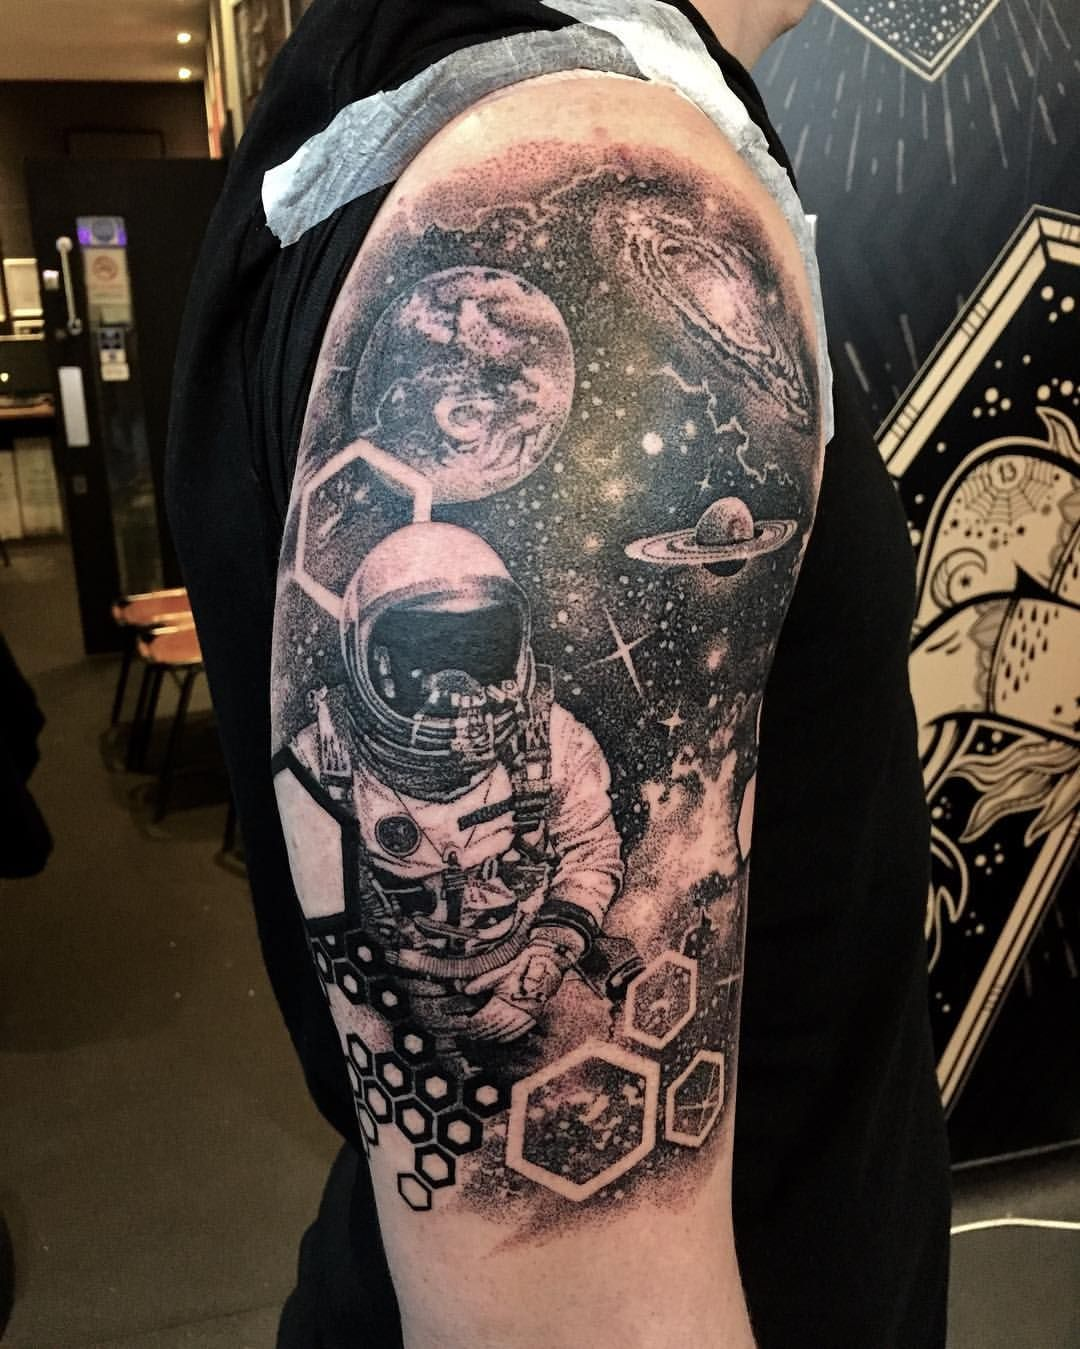 256 Likes 6 Comments Przemek Okonski Okonski3 On Instagram Anorher Space Spacetattoo Manchest Planet Tattoos Galaxy Tattoo Sleeve Space Tattoo Sleeve